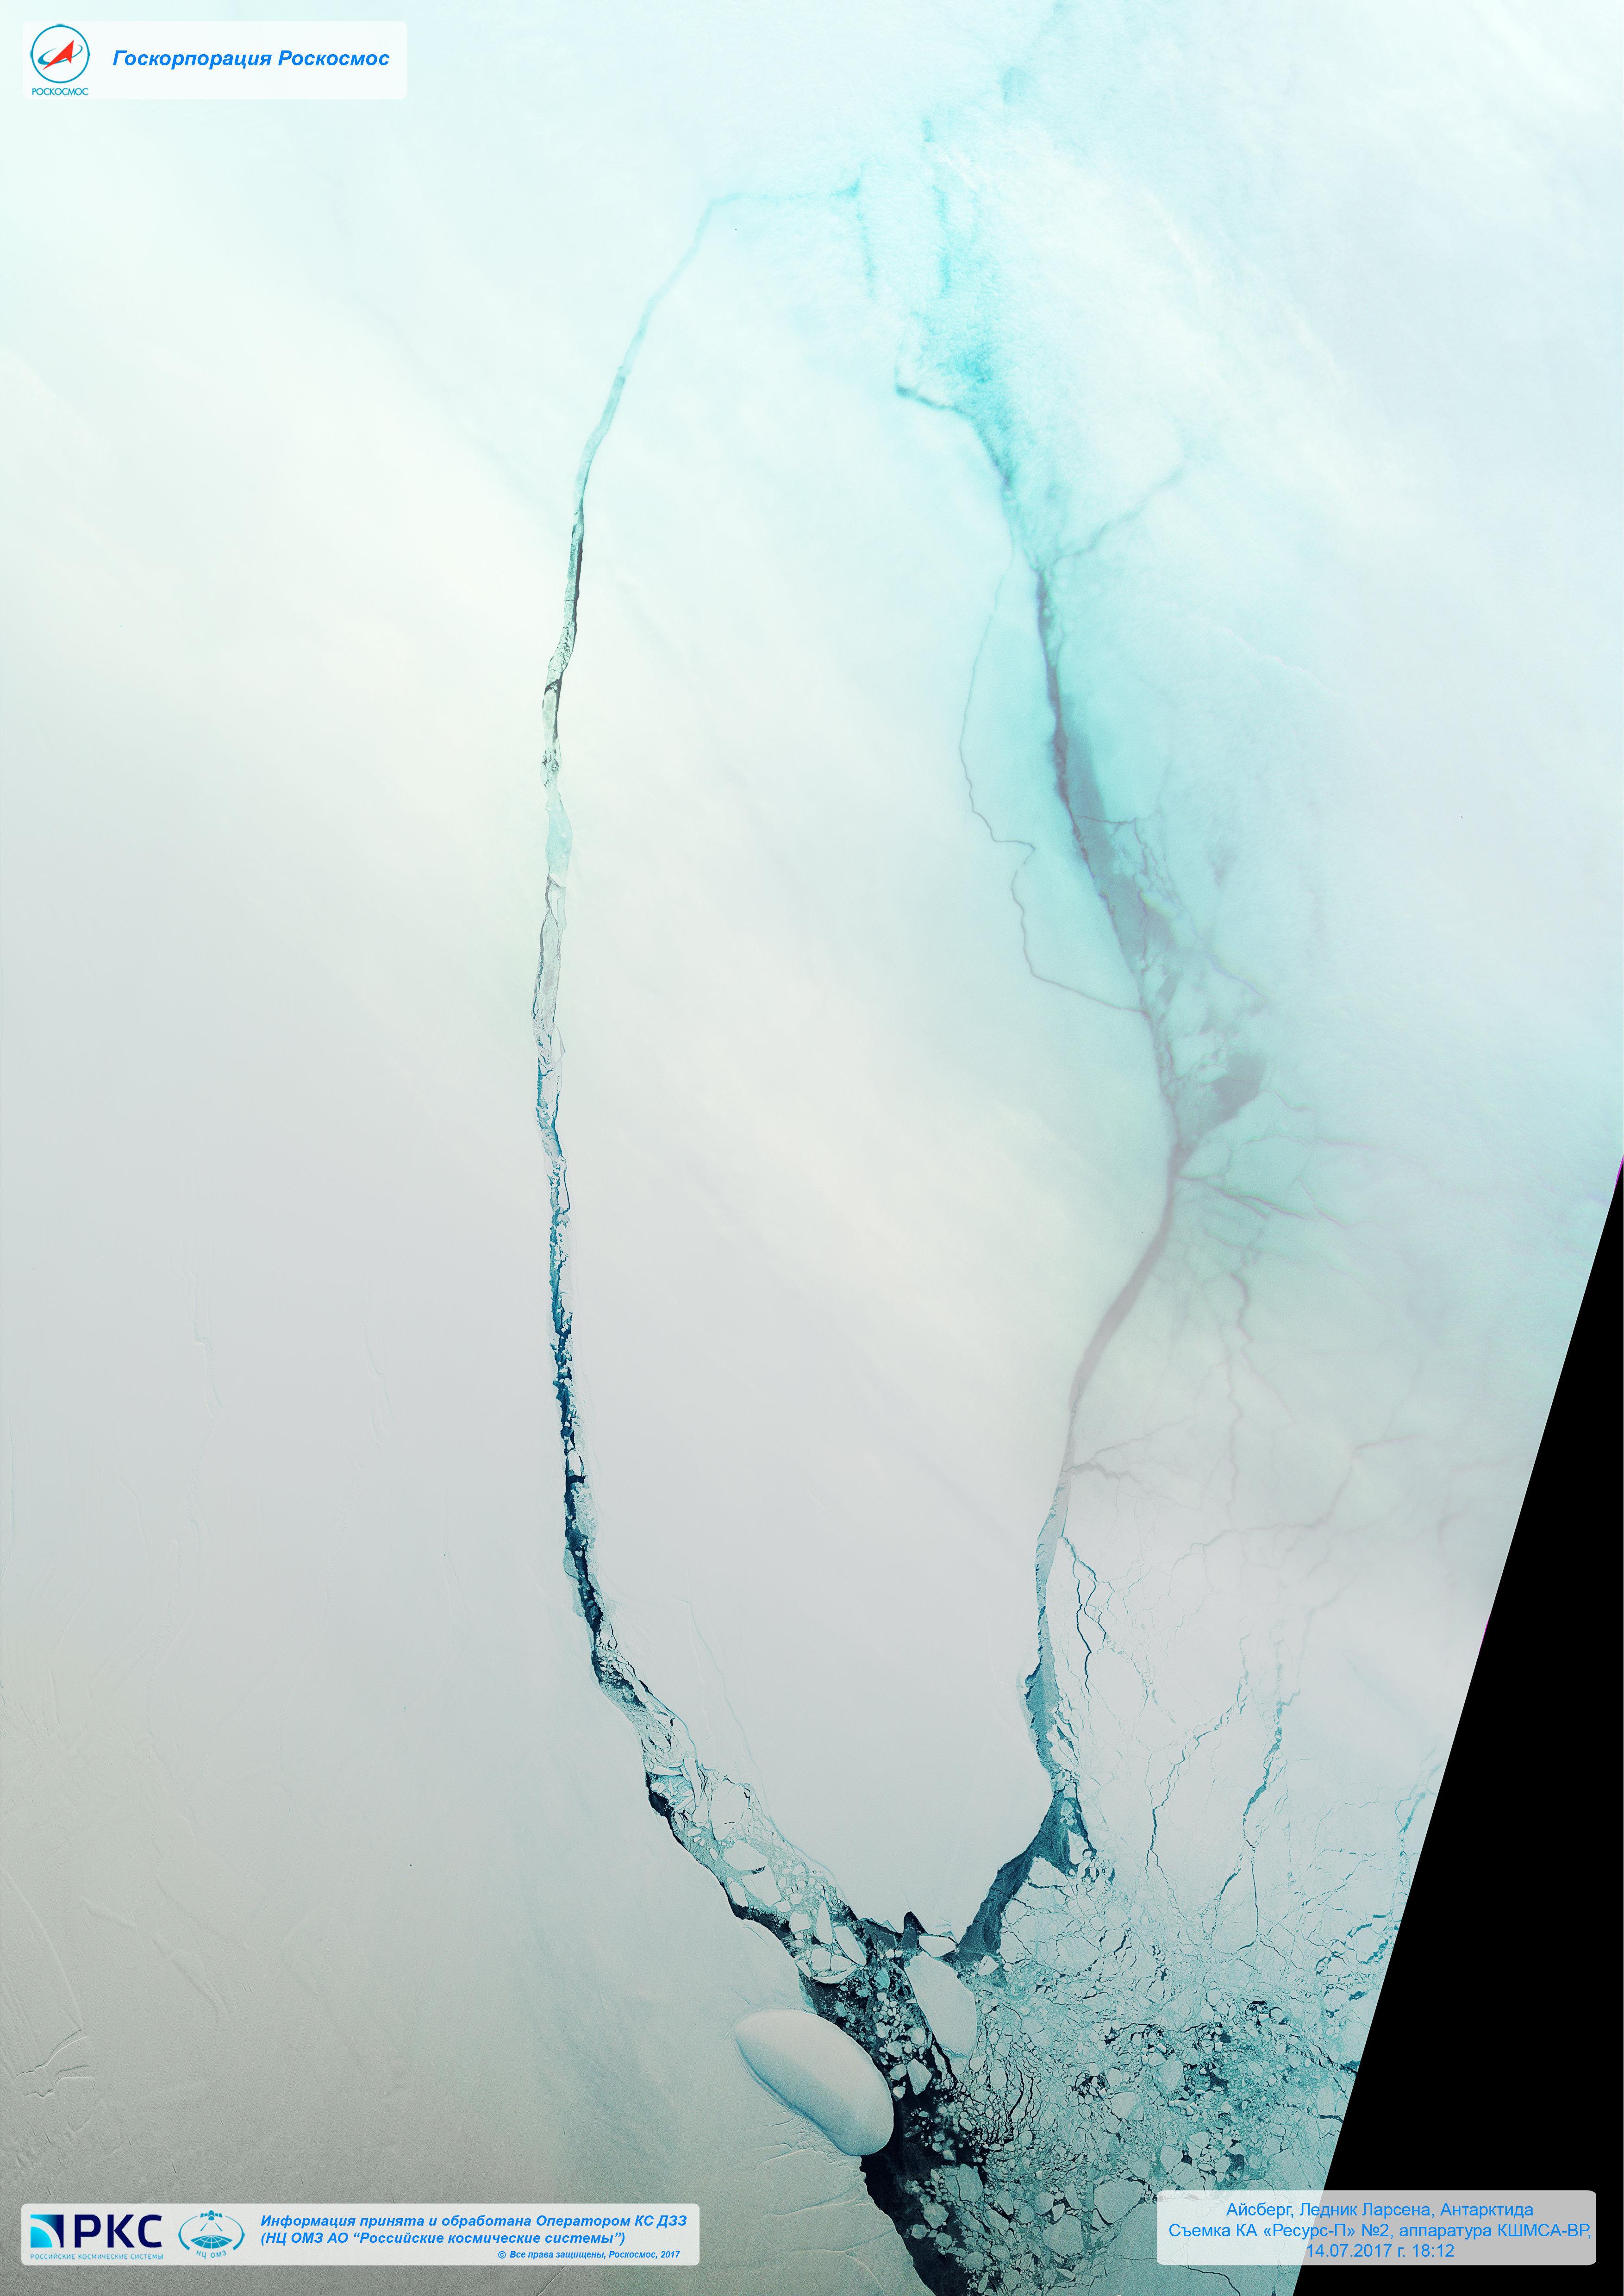 Iceberg desprendido del glaciar Larsen